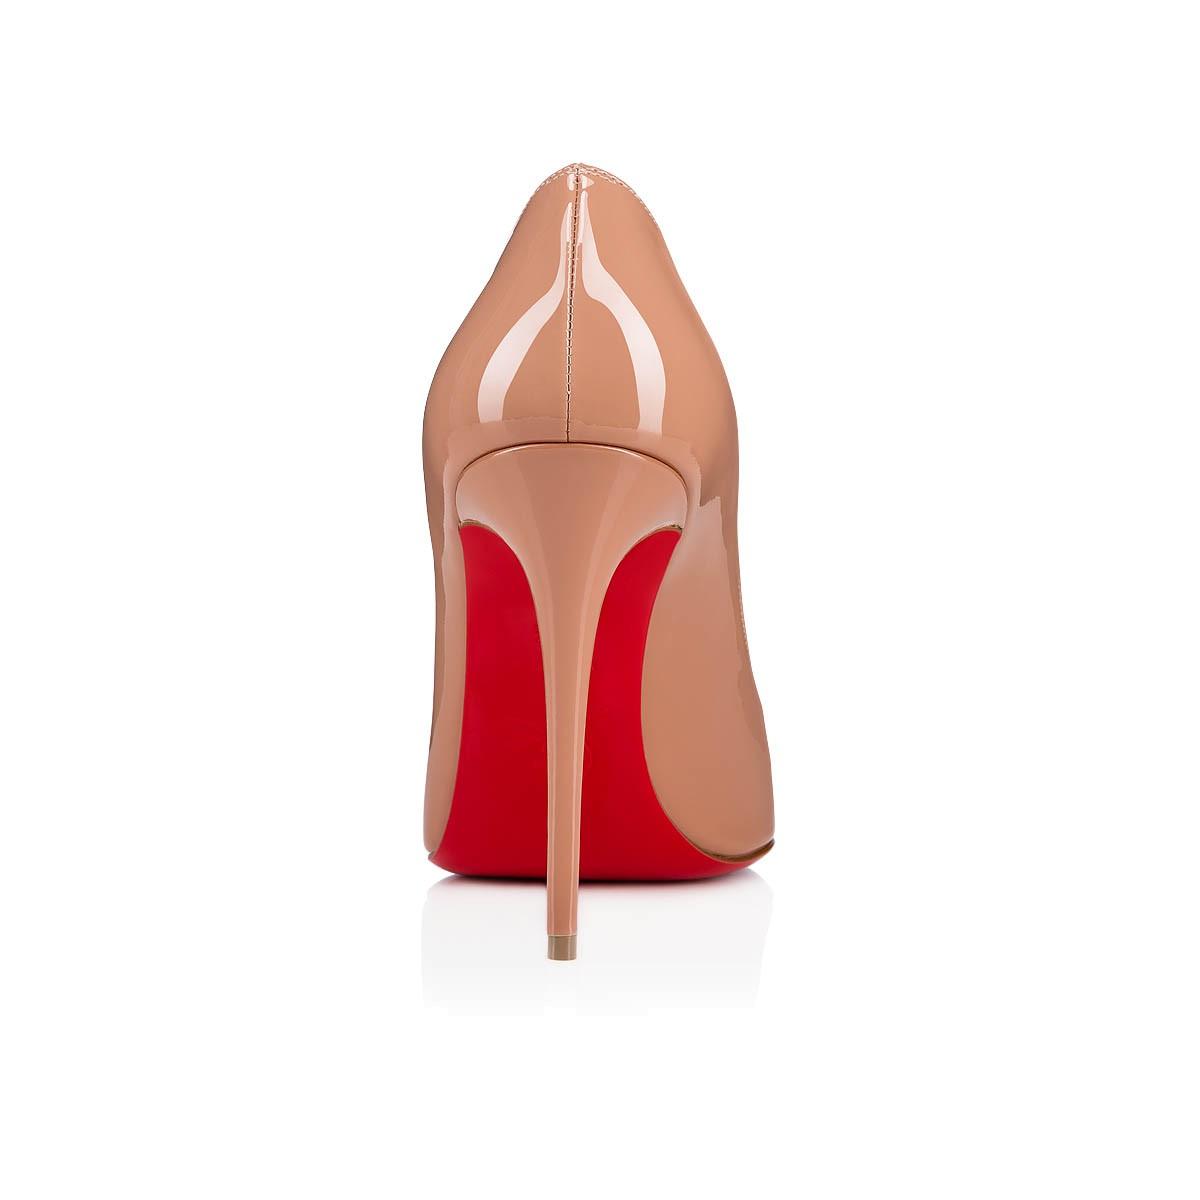 鞋履 - Kate - Christian Louboutin